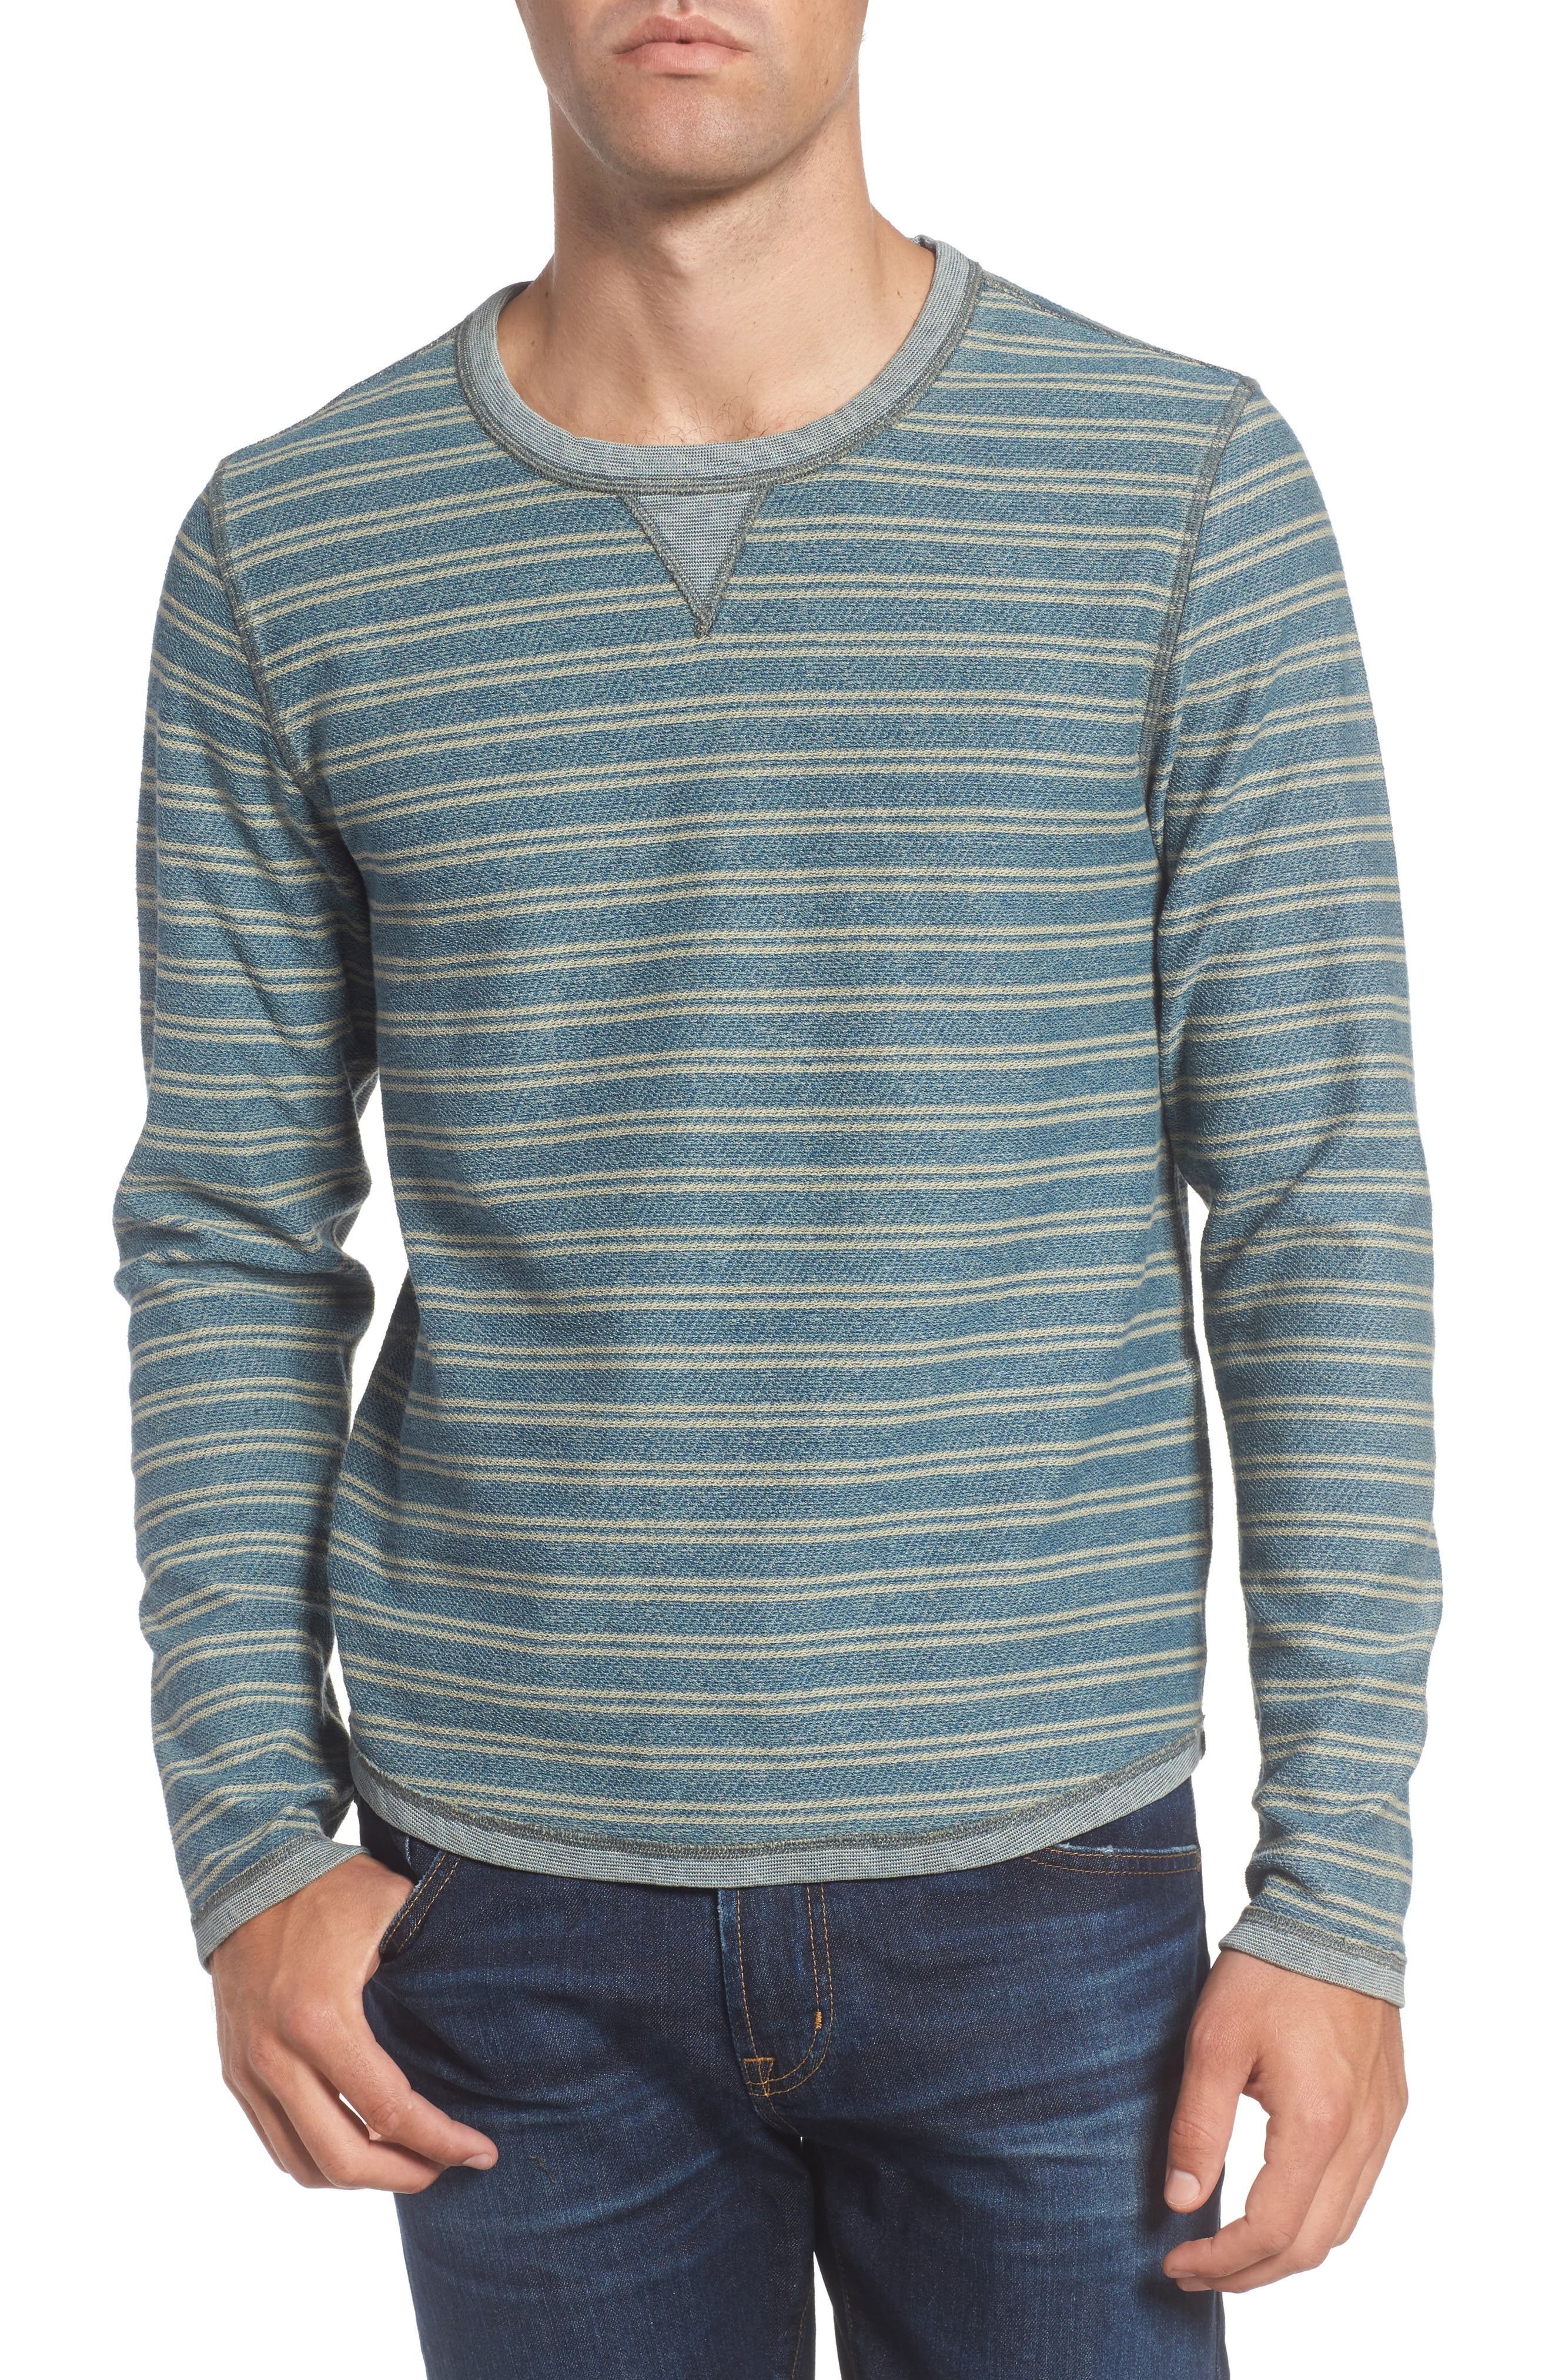 Main Image - Jeremiah Strickland Reversible Crewneck Sweatshirt